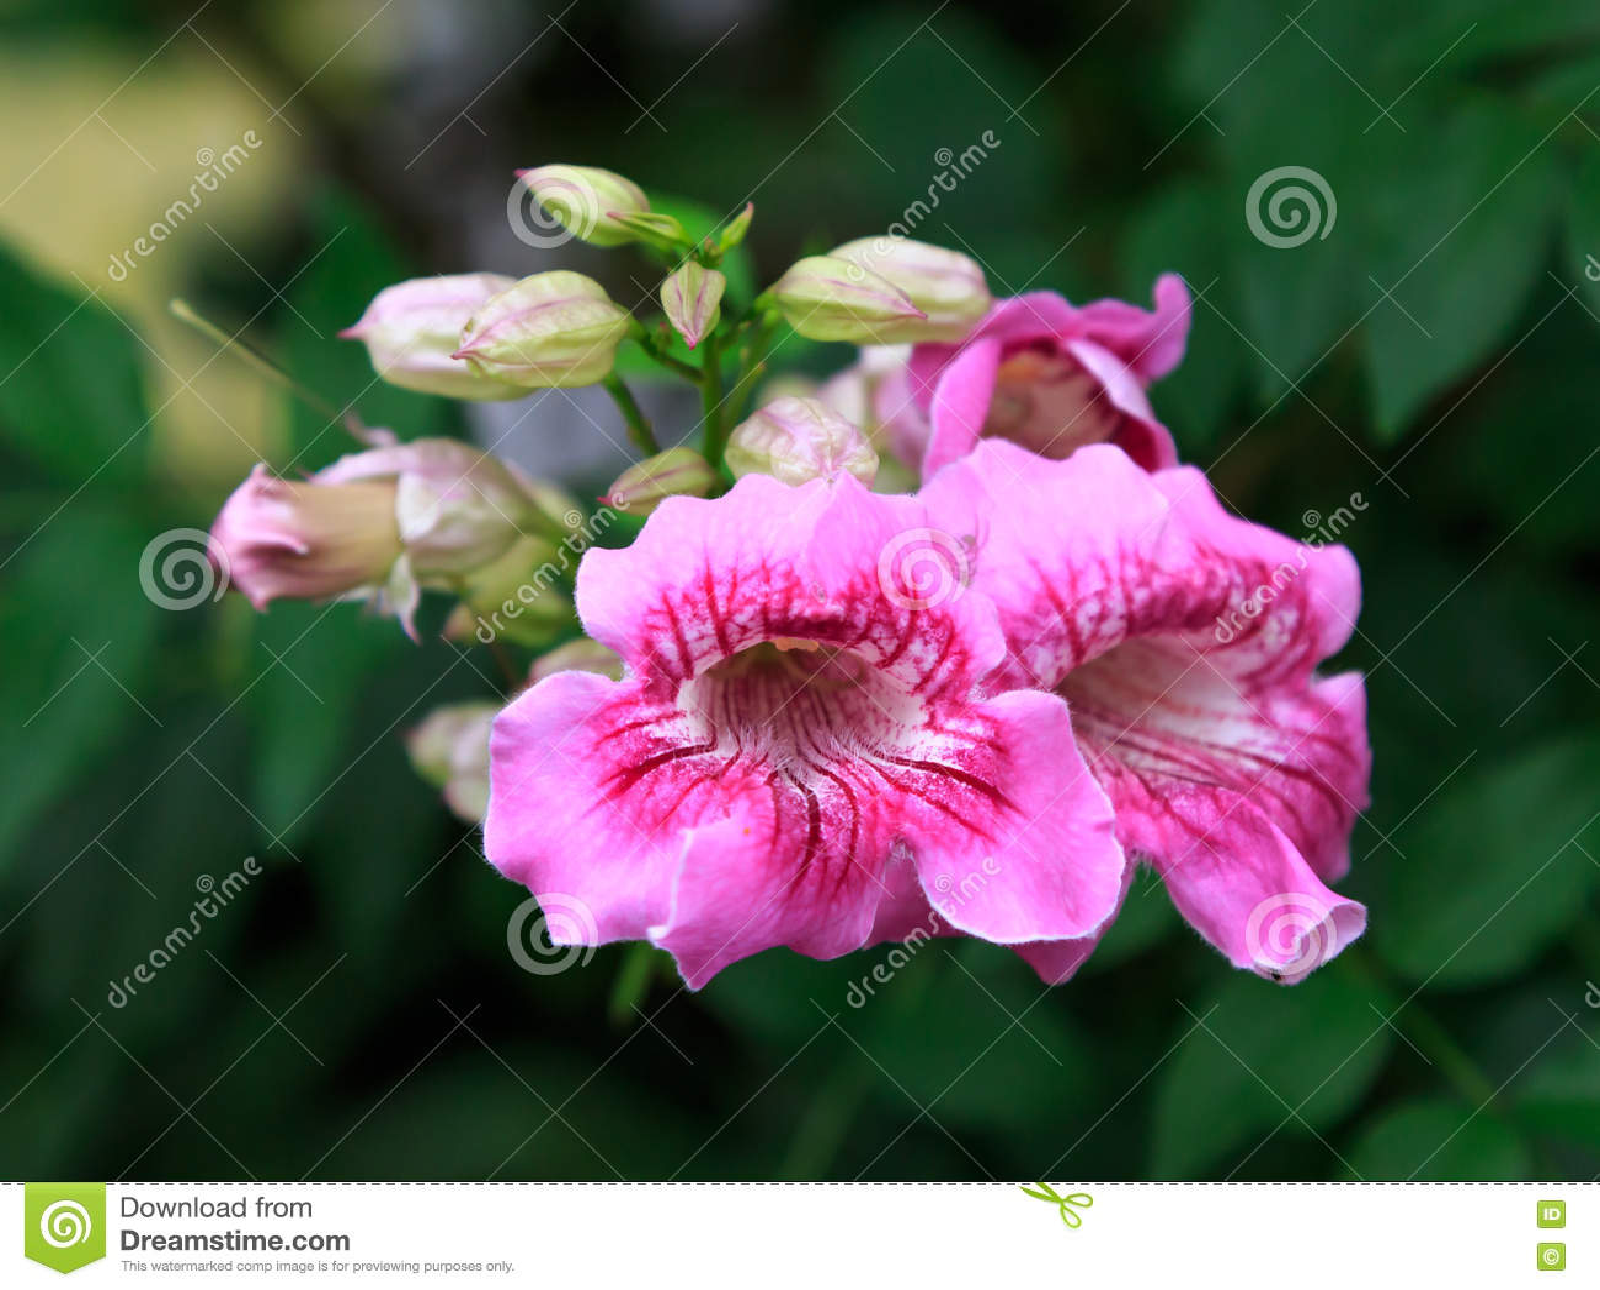 Pink trumpet vine flower stock image image of background 78208957 pink trumpet vine flower mightylinksfo